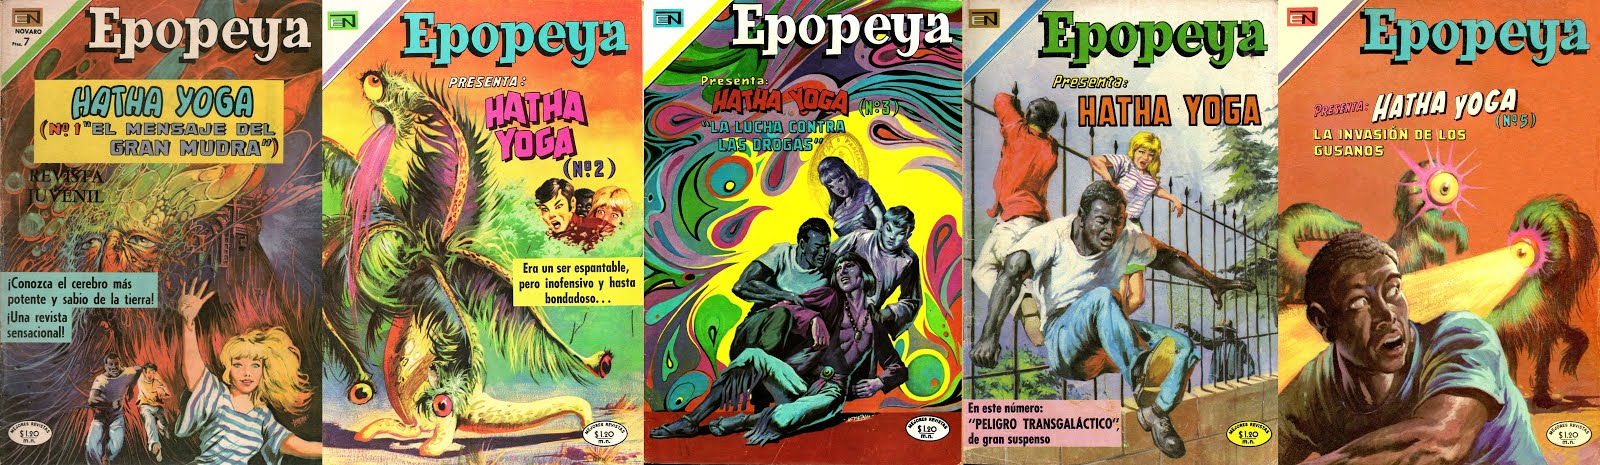 Nuevos enlaces: La serie Hatha-Yoga en Epopeya Novaro